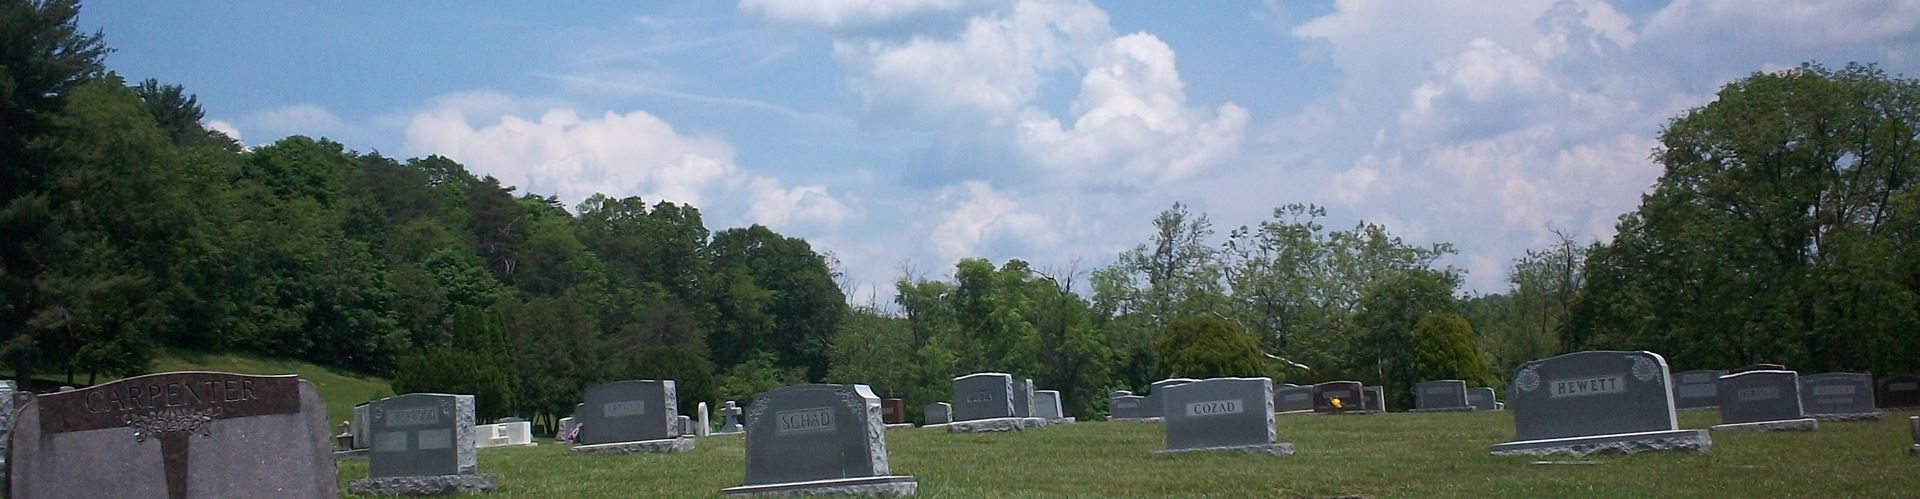 Hillcrest Burial Park, MD